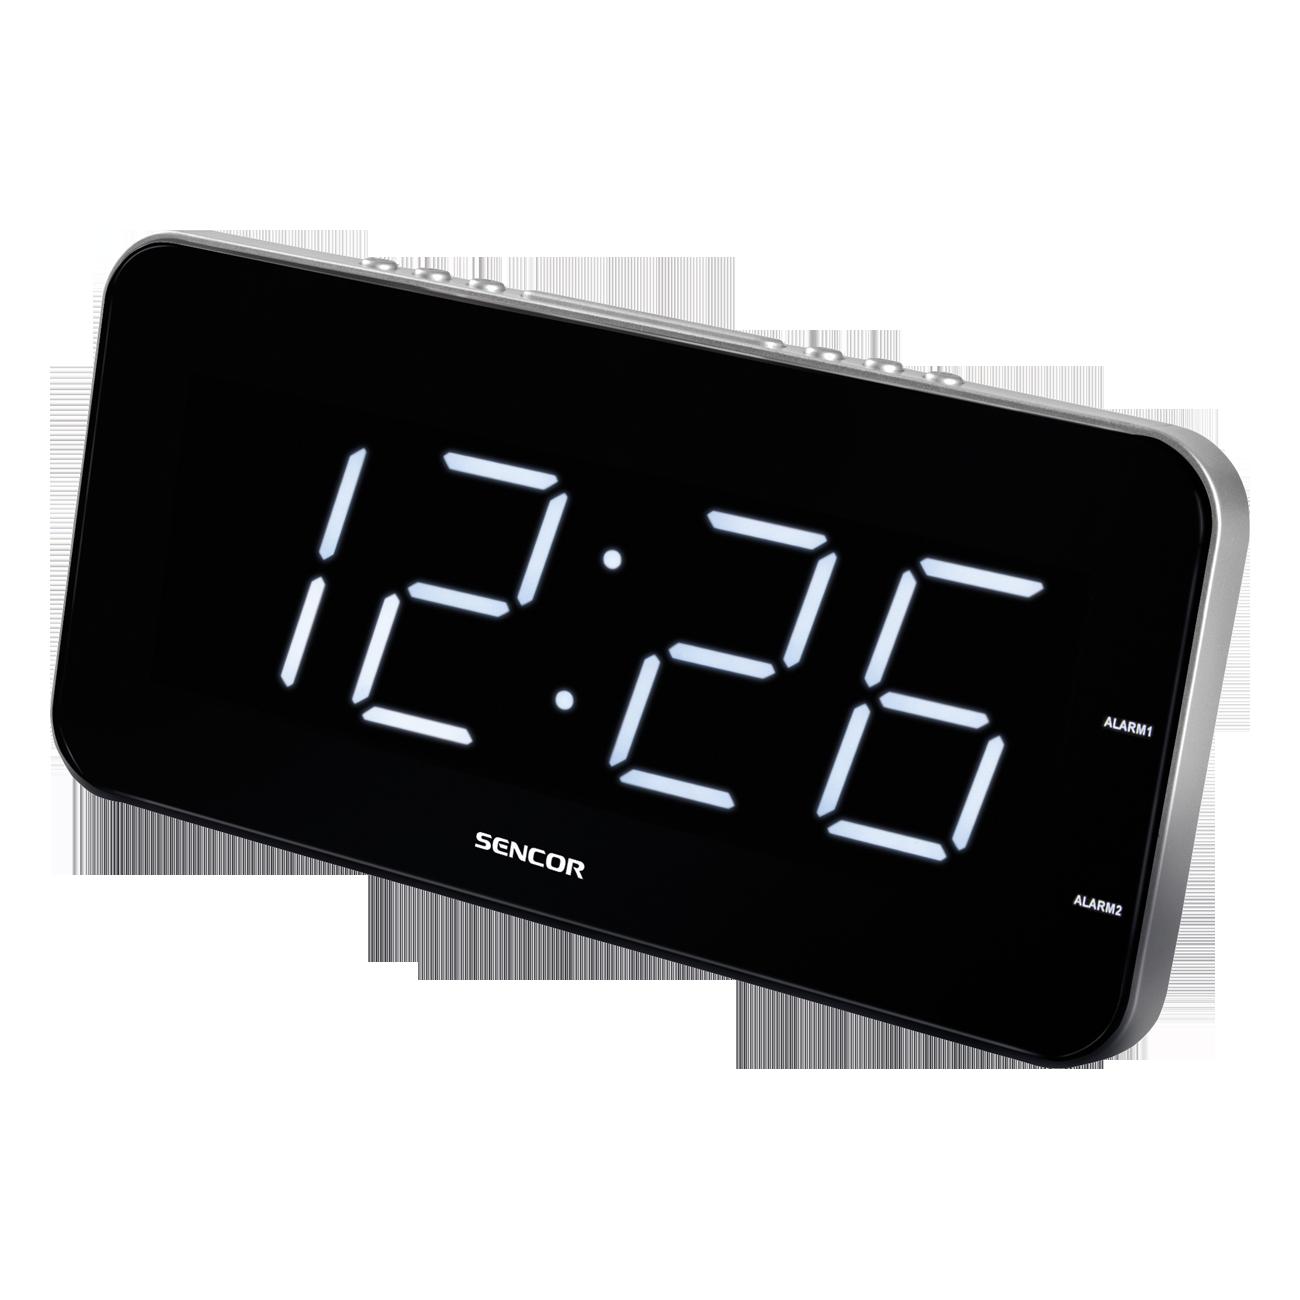 Sencor SDC 130 WH Alarm clock radio, radiopulksteņi